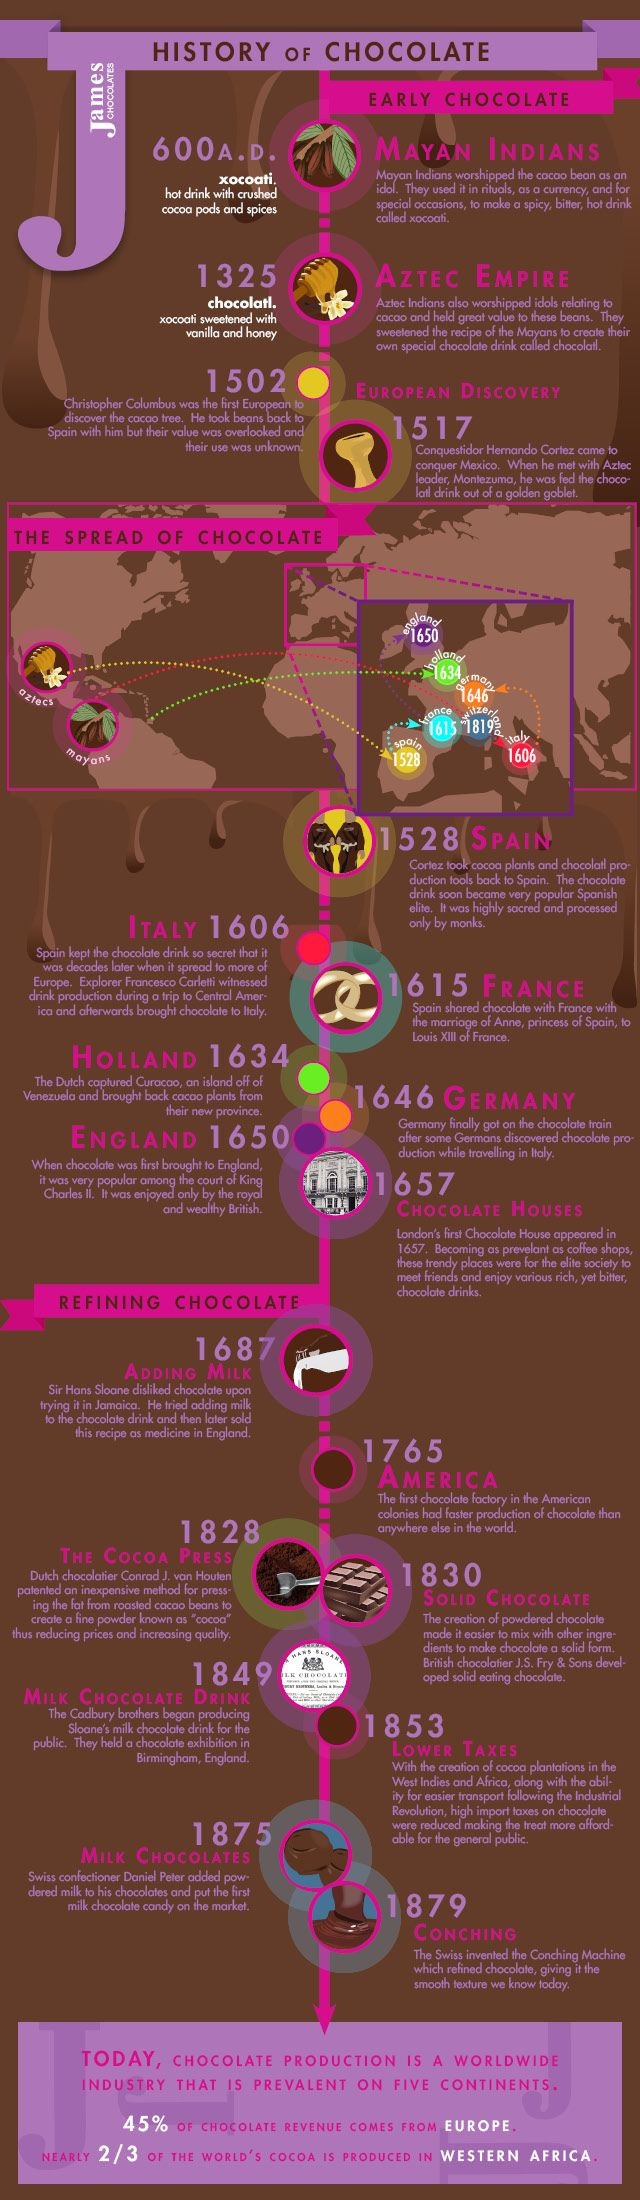 La Historia del Chocolate | History of Chocolate